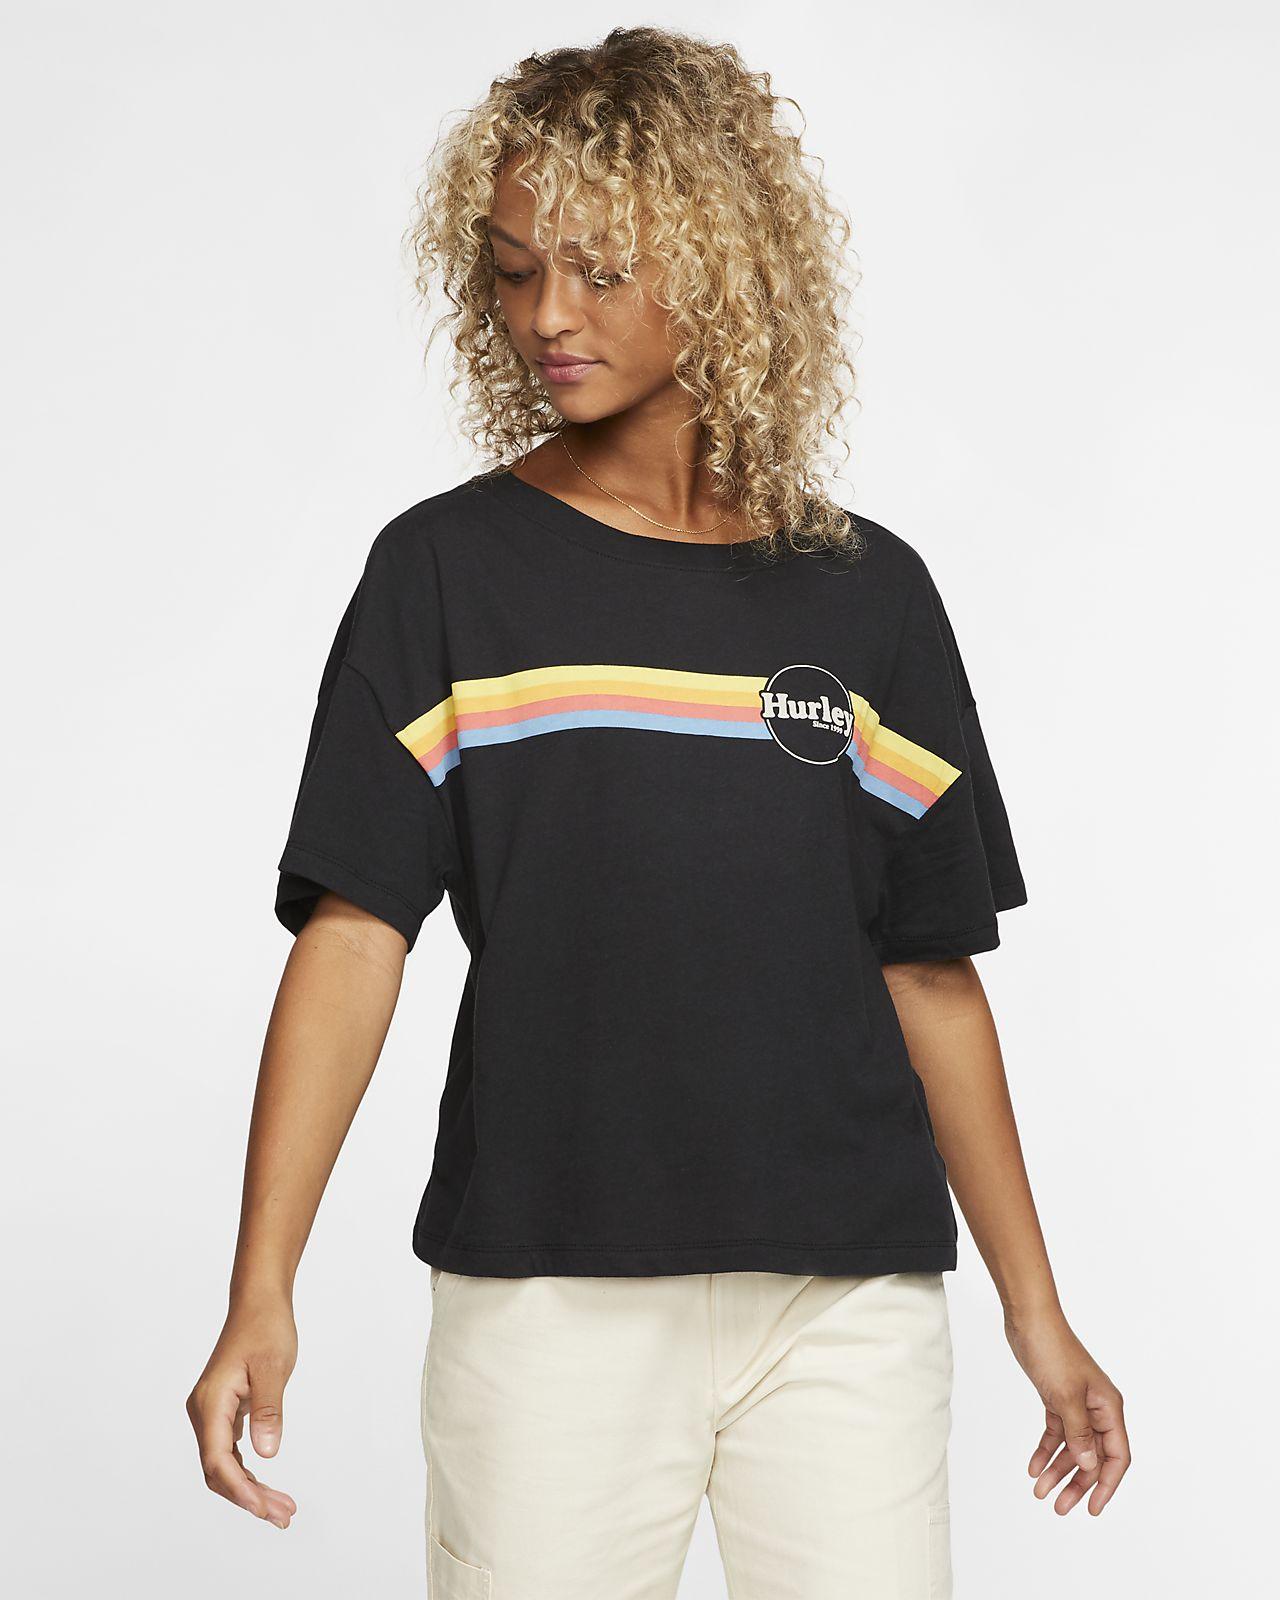 Tee-shirt Hurley Jammer Stripe Flouncy pour Femme